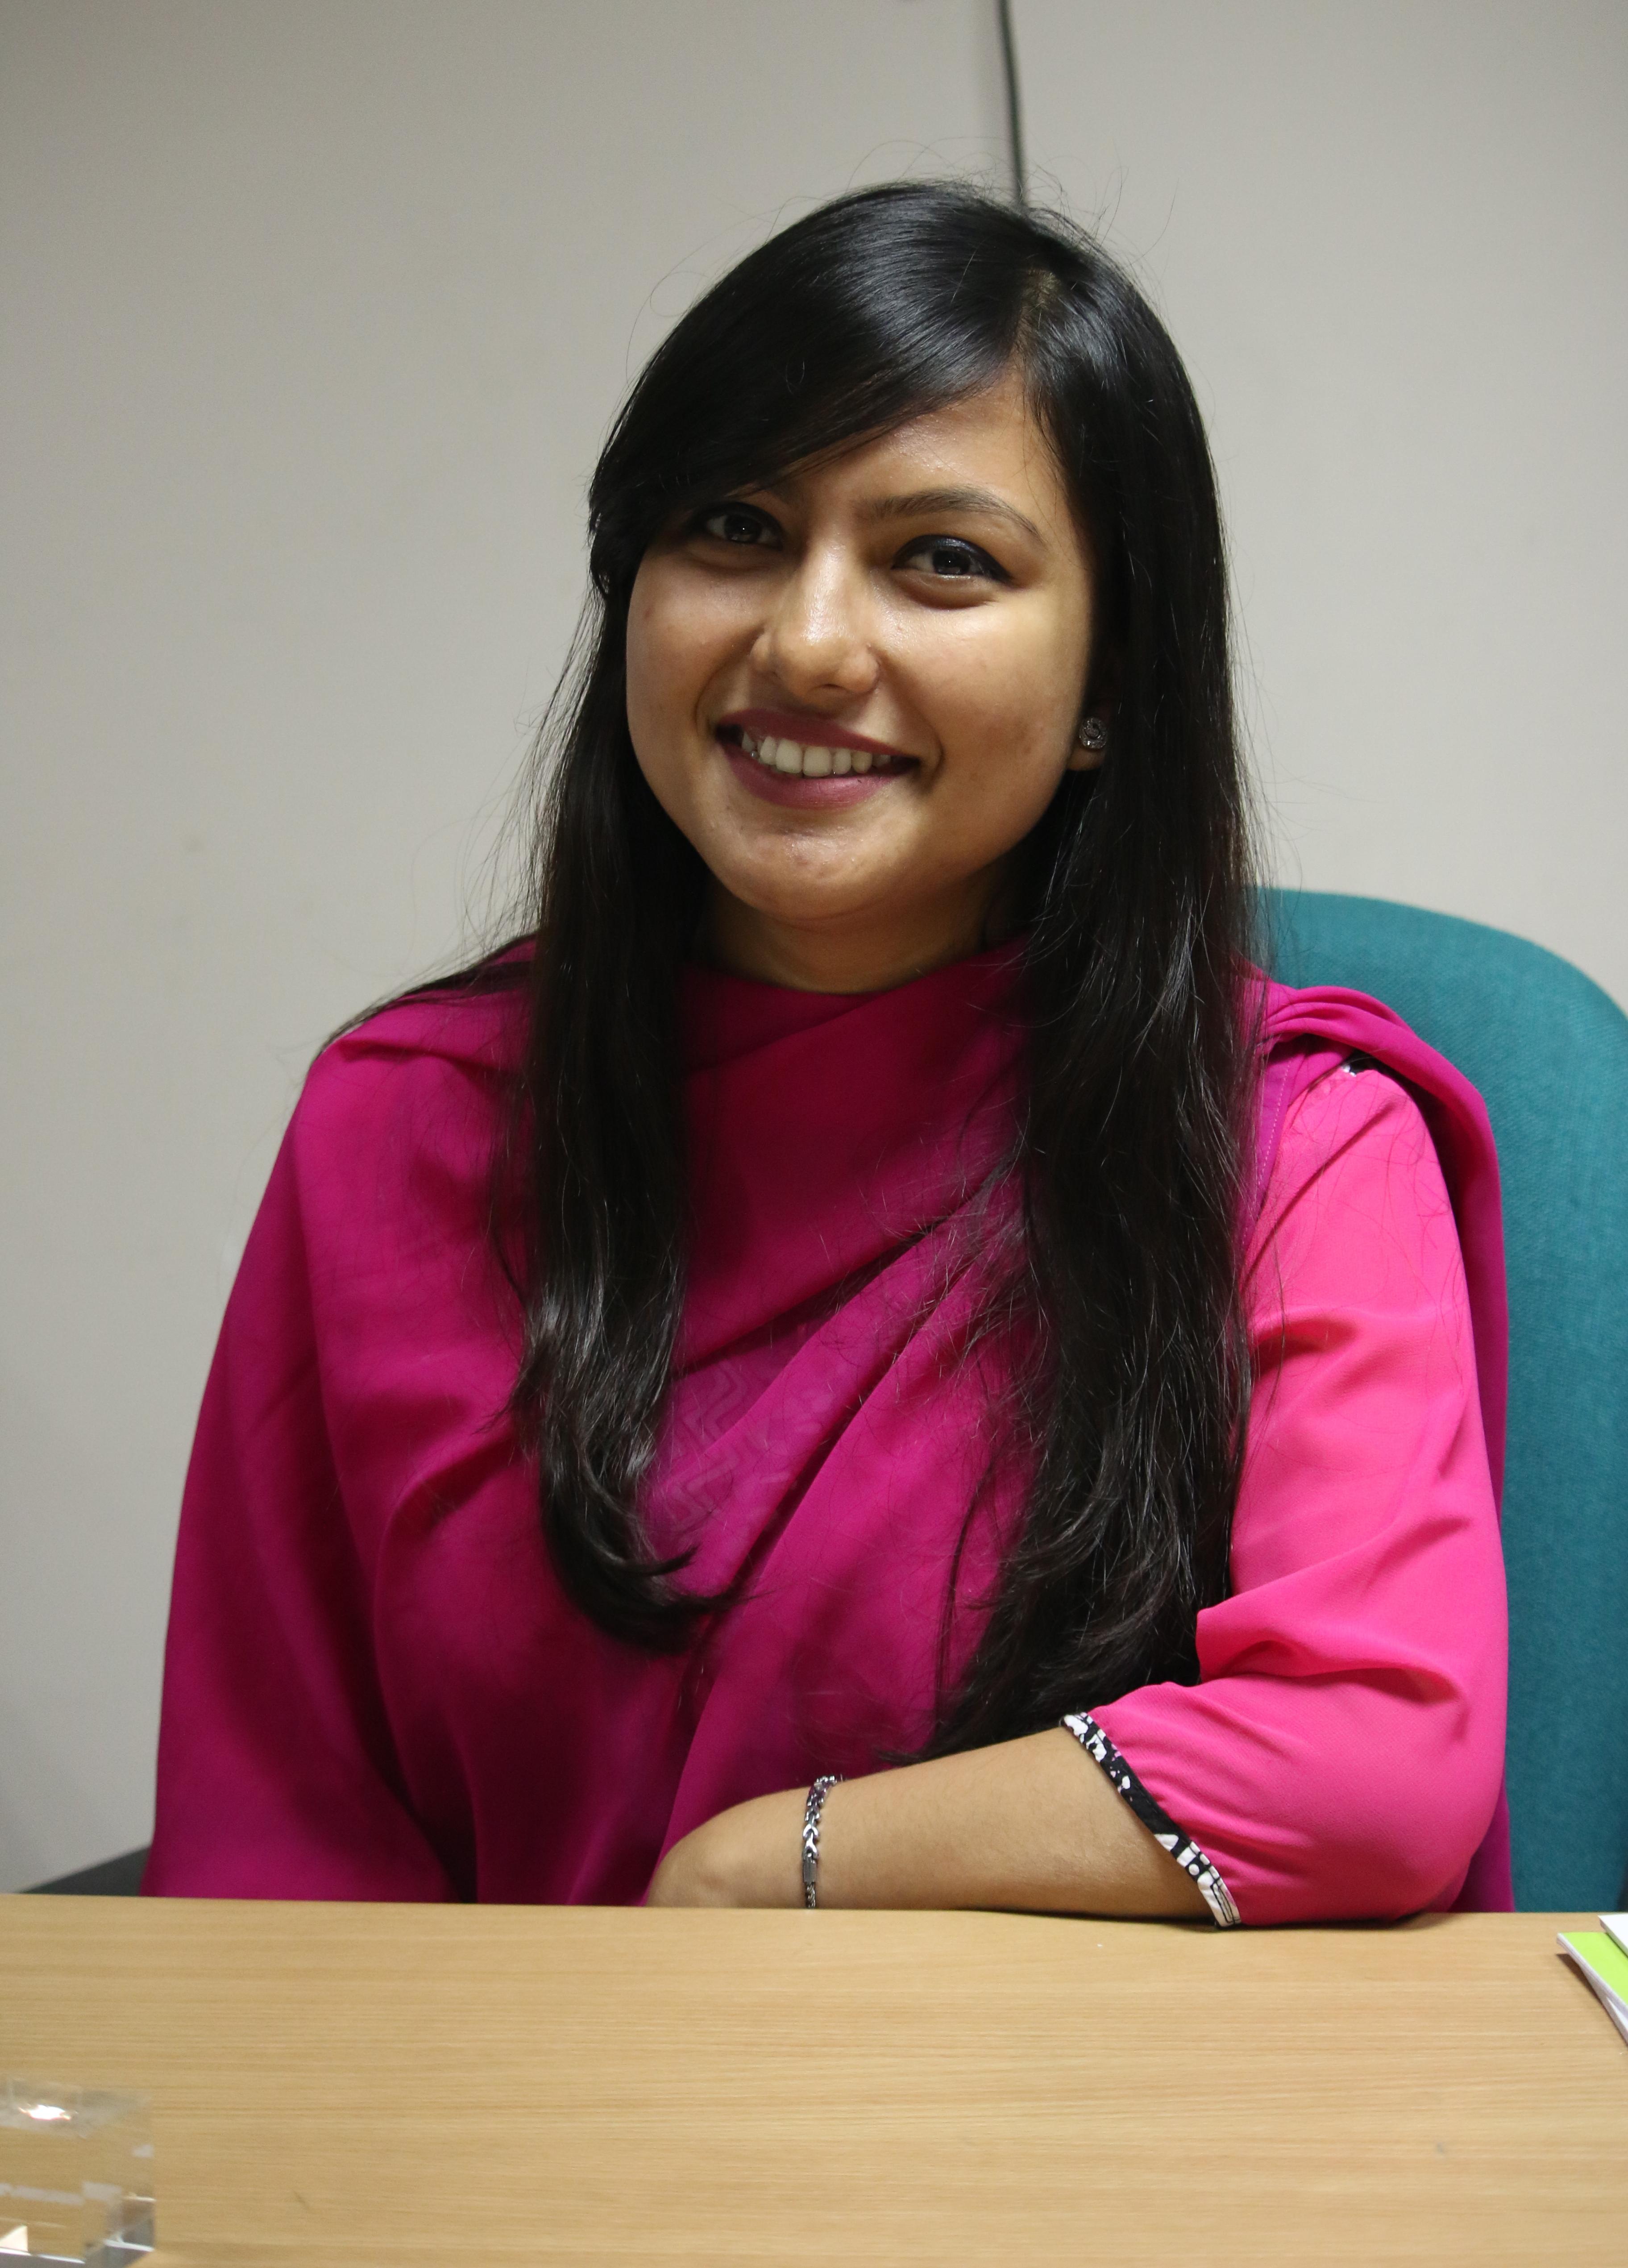 Ms. Mukta Rani Nath